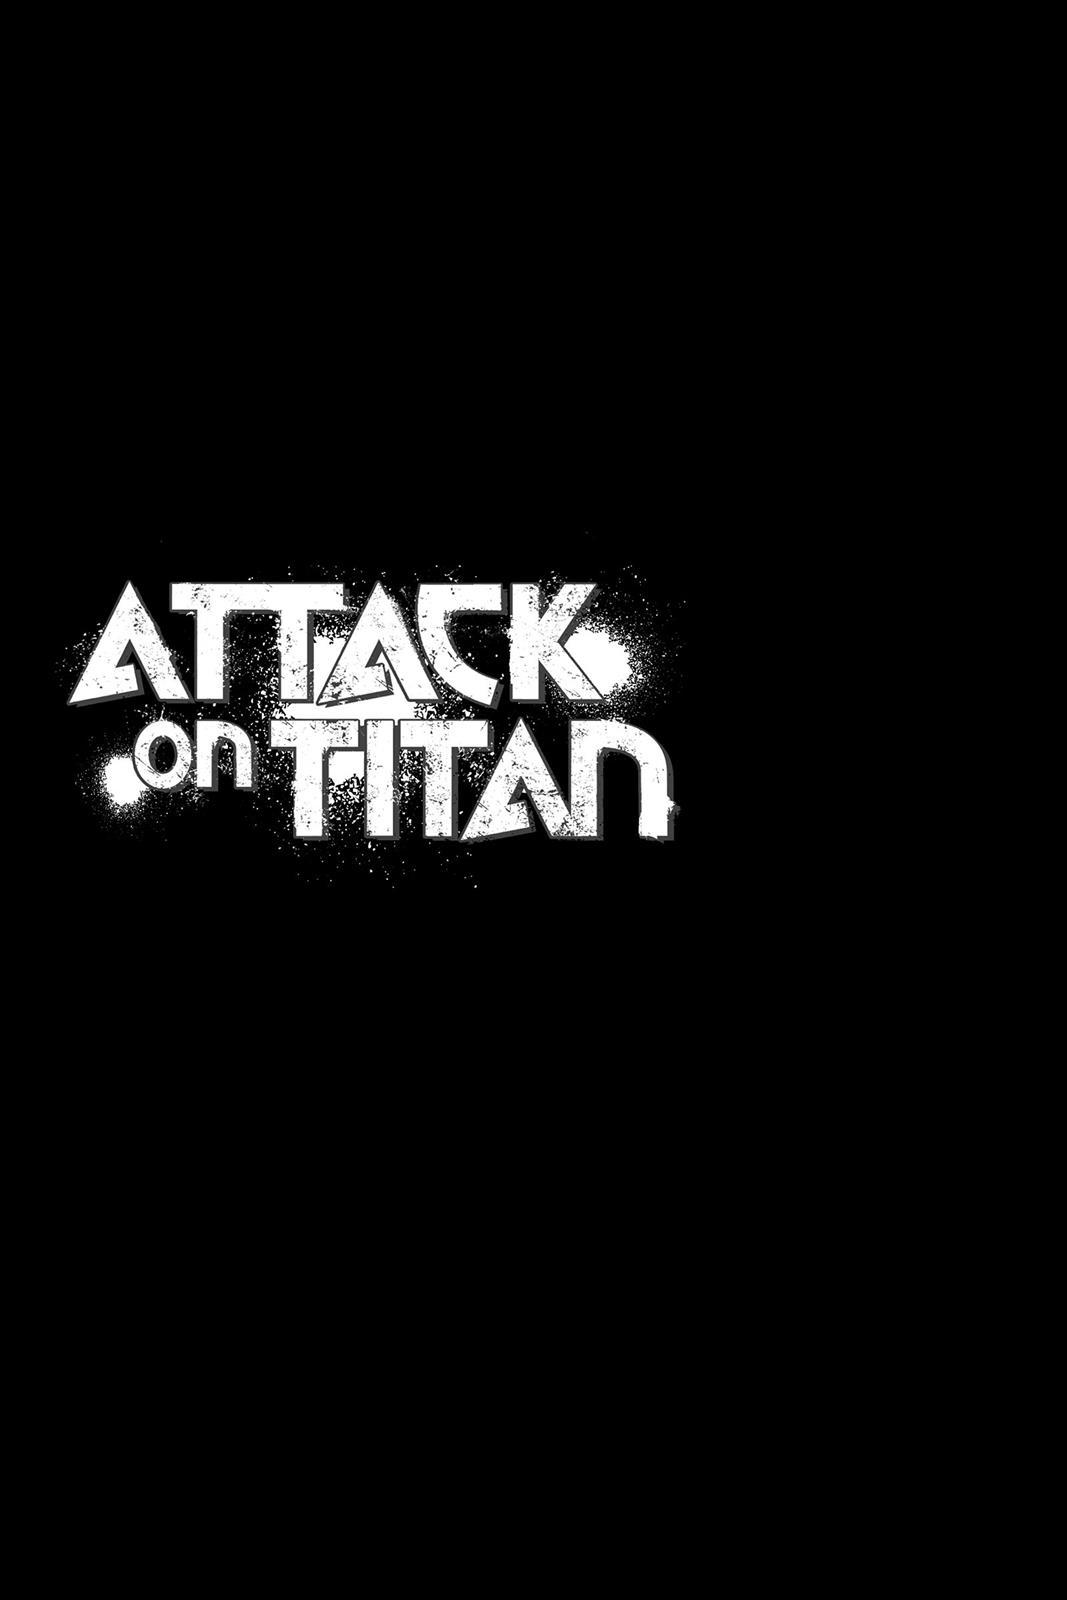 Attack On Titan, Episode 89 image 046